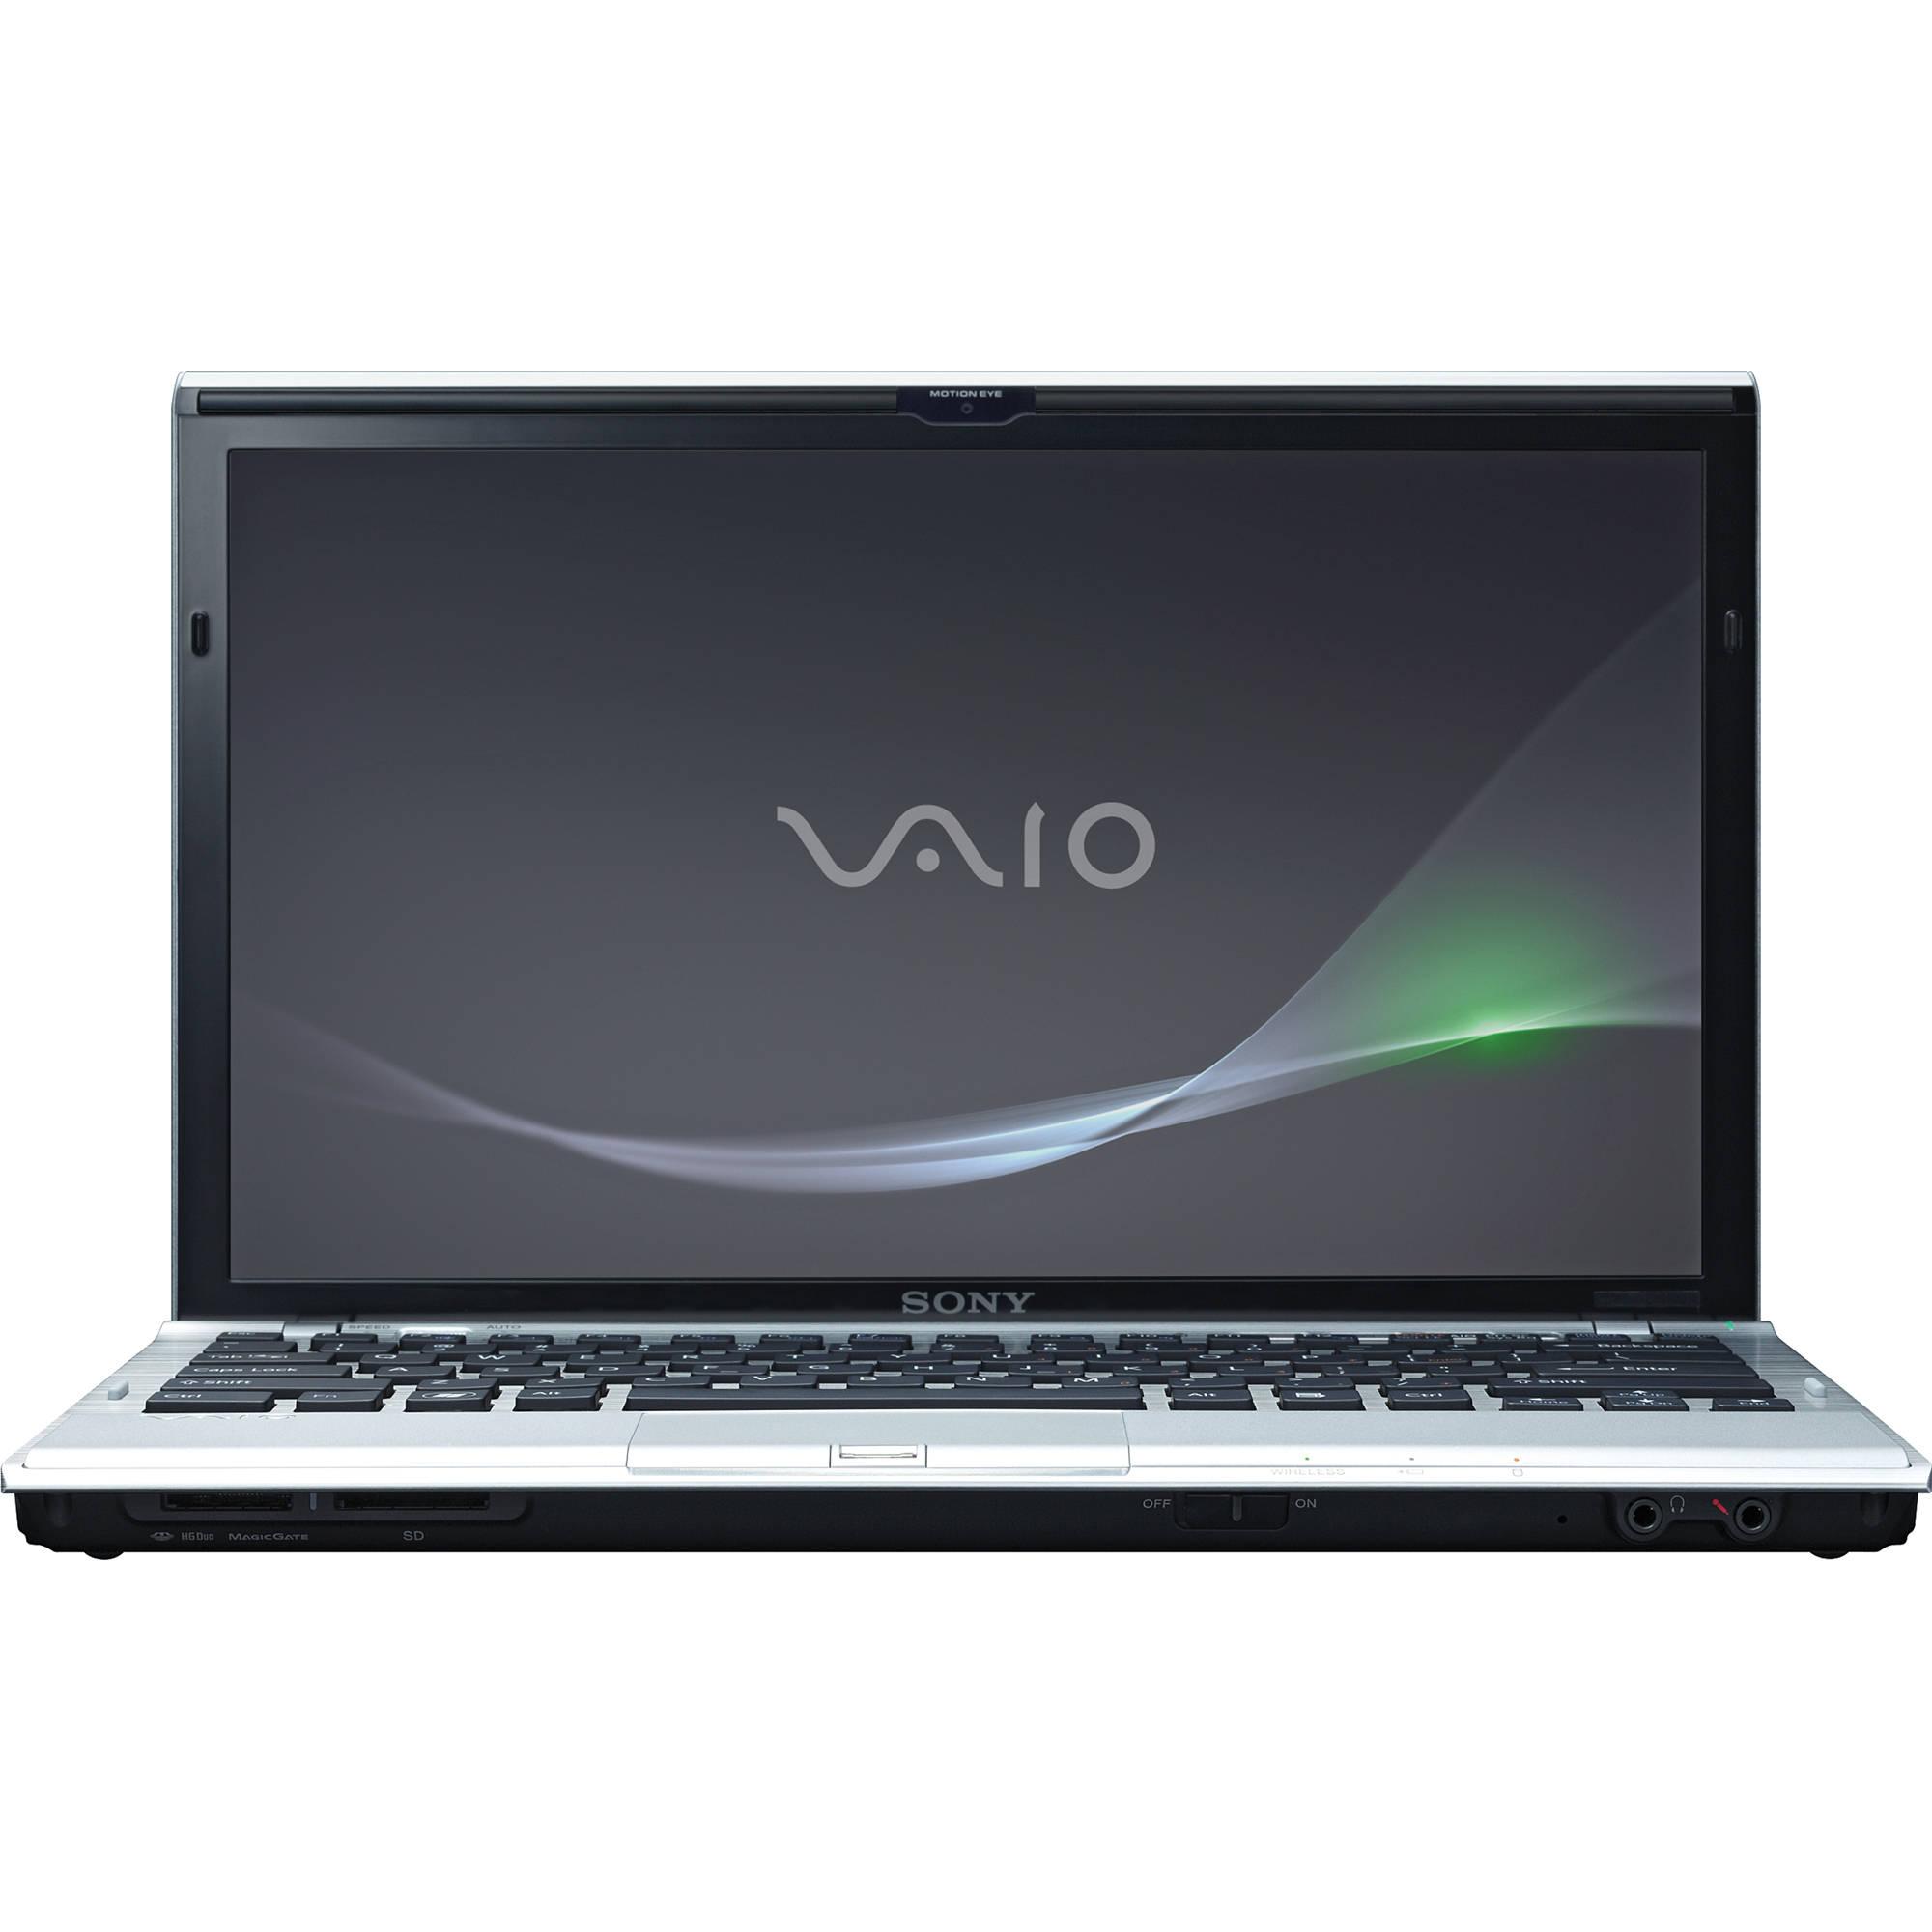 Sony Vaio VPCZ122GX/S Intel Graphics Drivers Windows XP